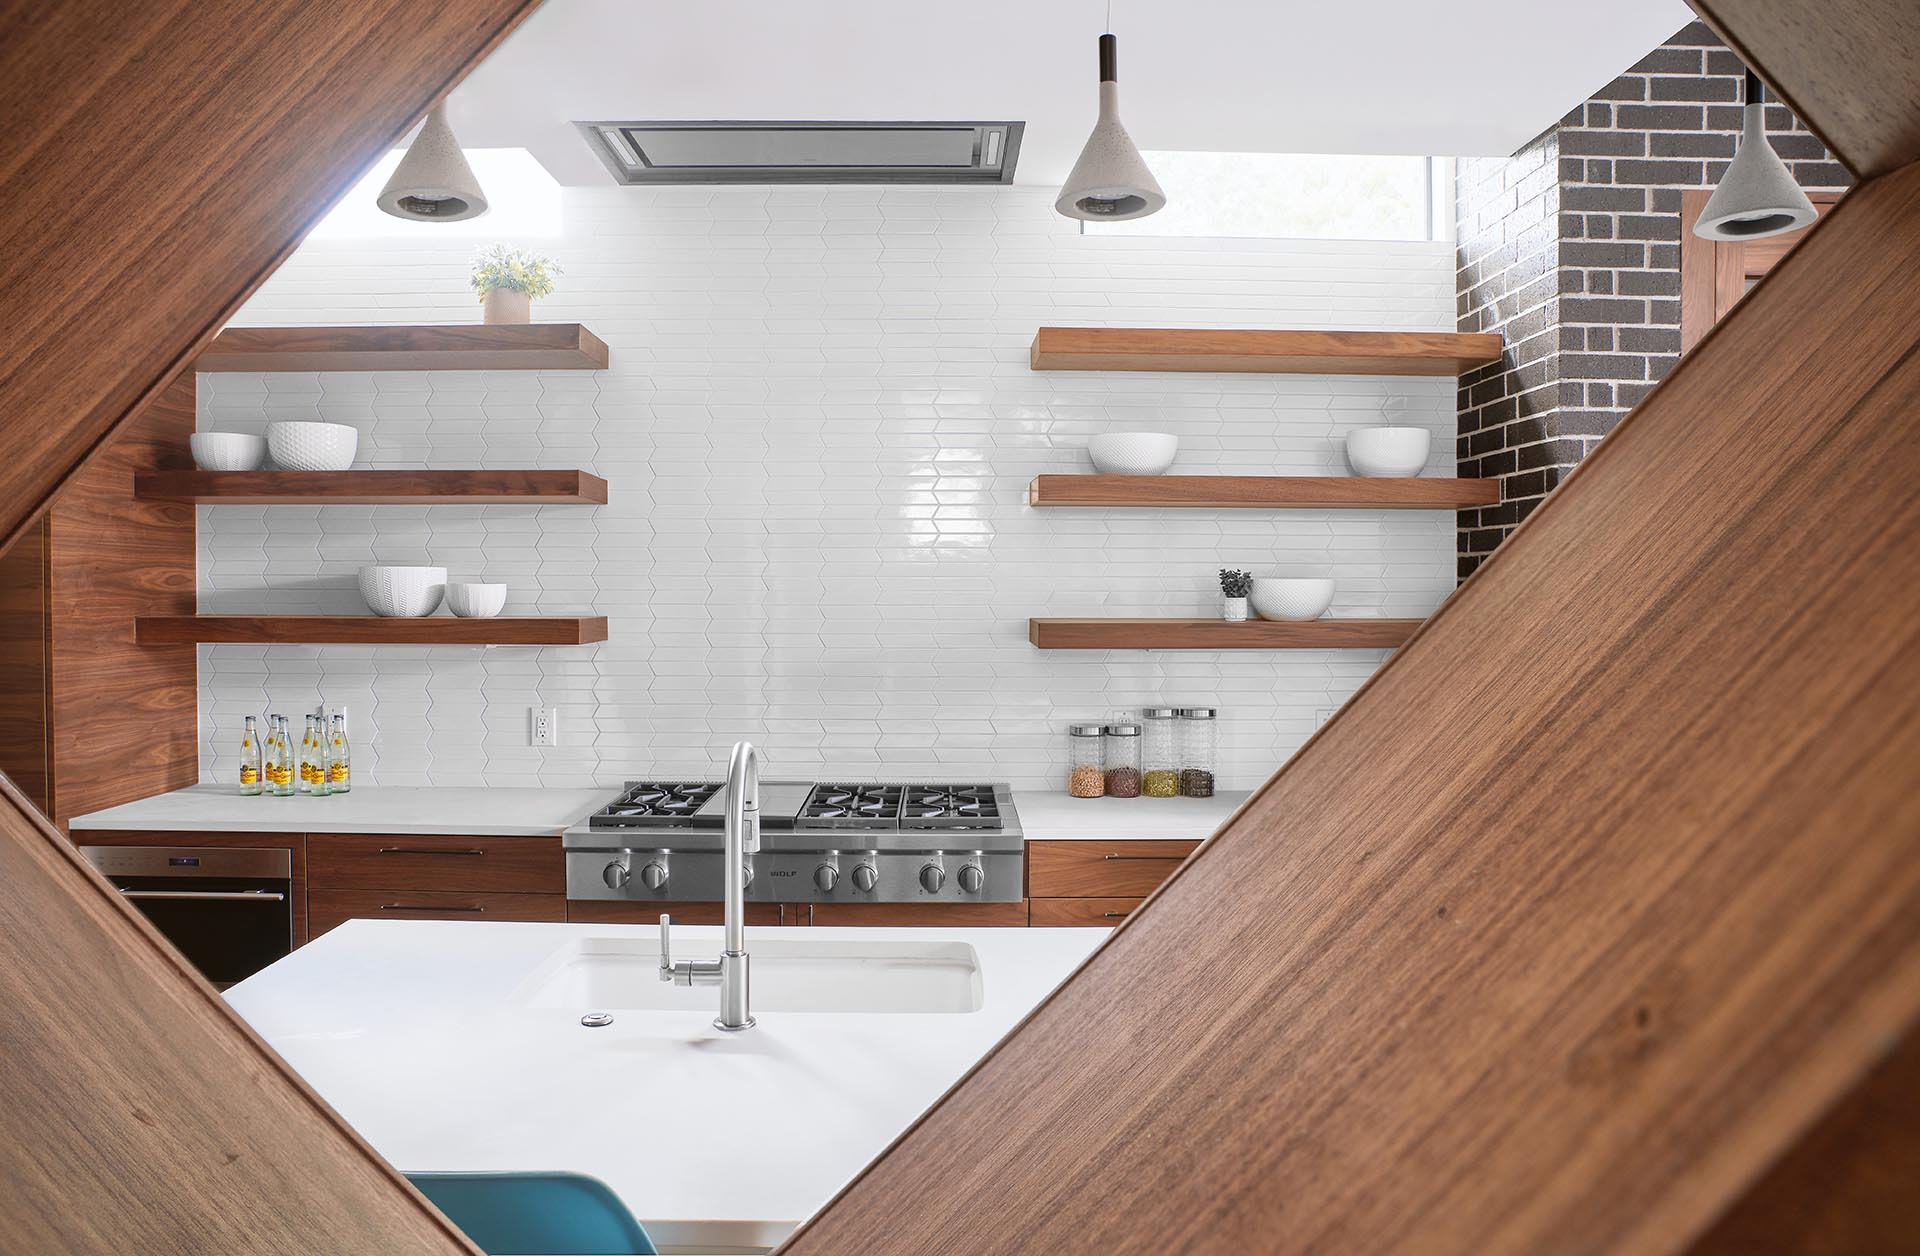 A open wood shelf provides a view of a modern kitchen.